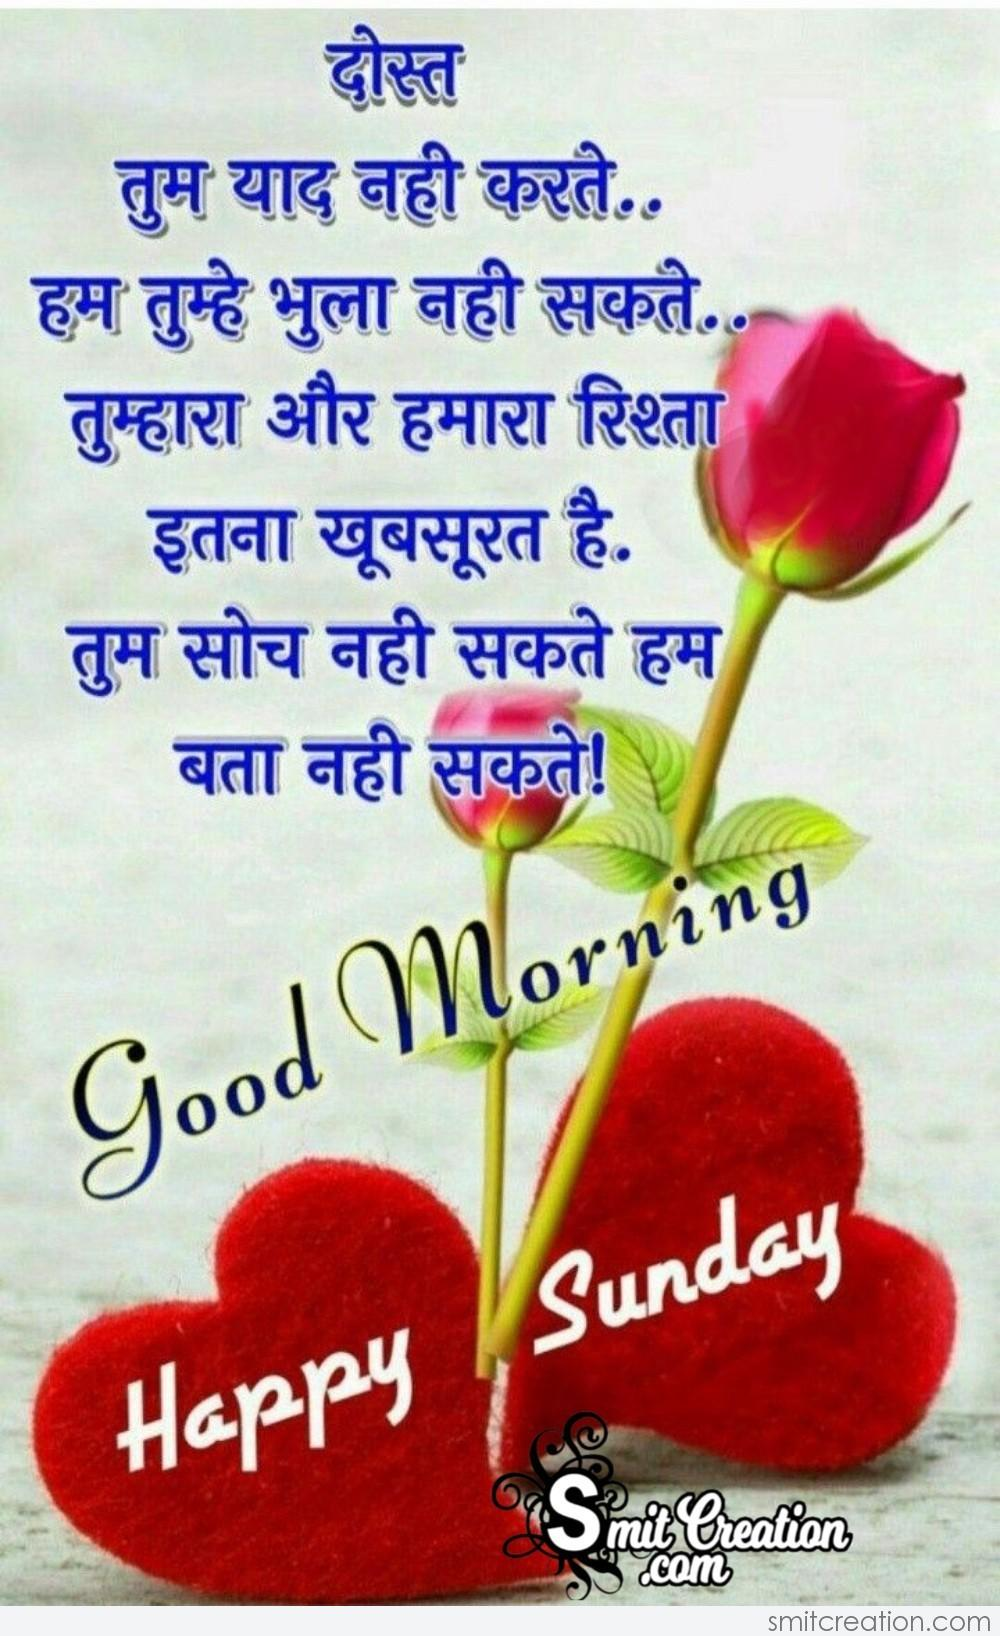 Good Morning Happy Sunday Dost Smitcreation Com